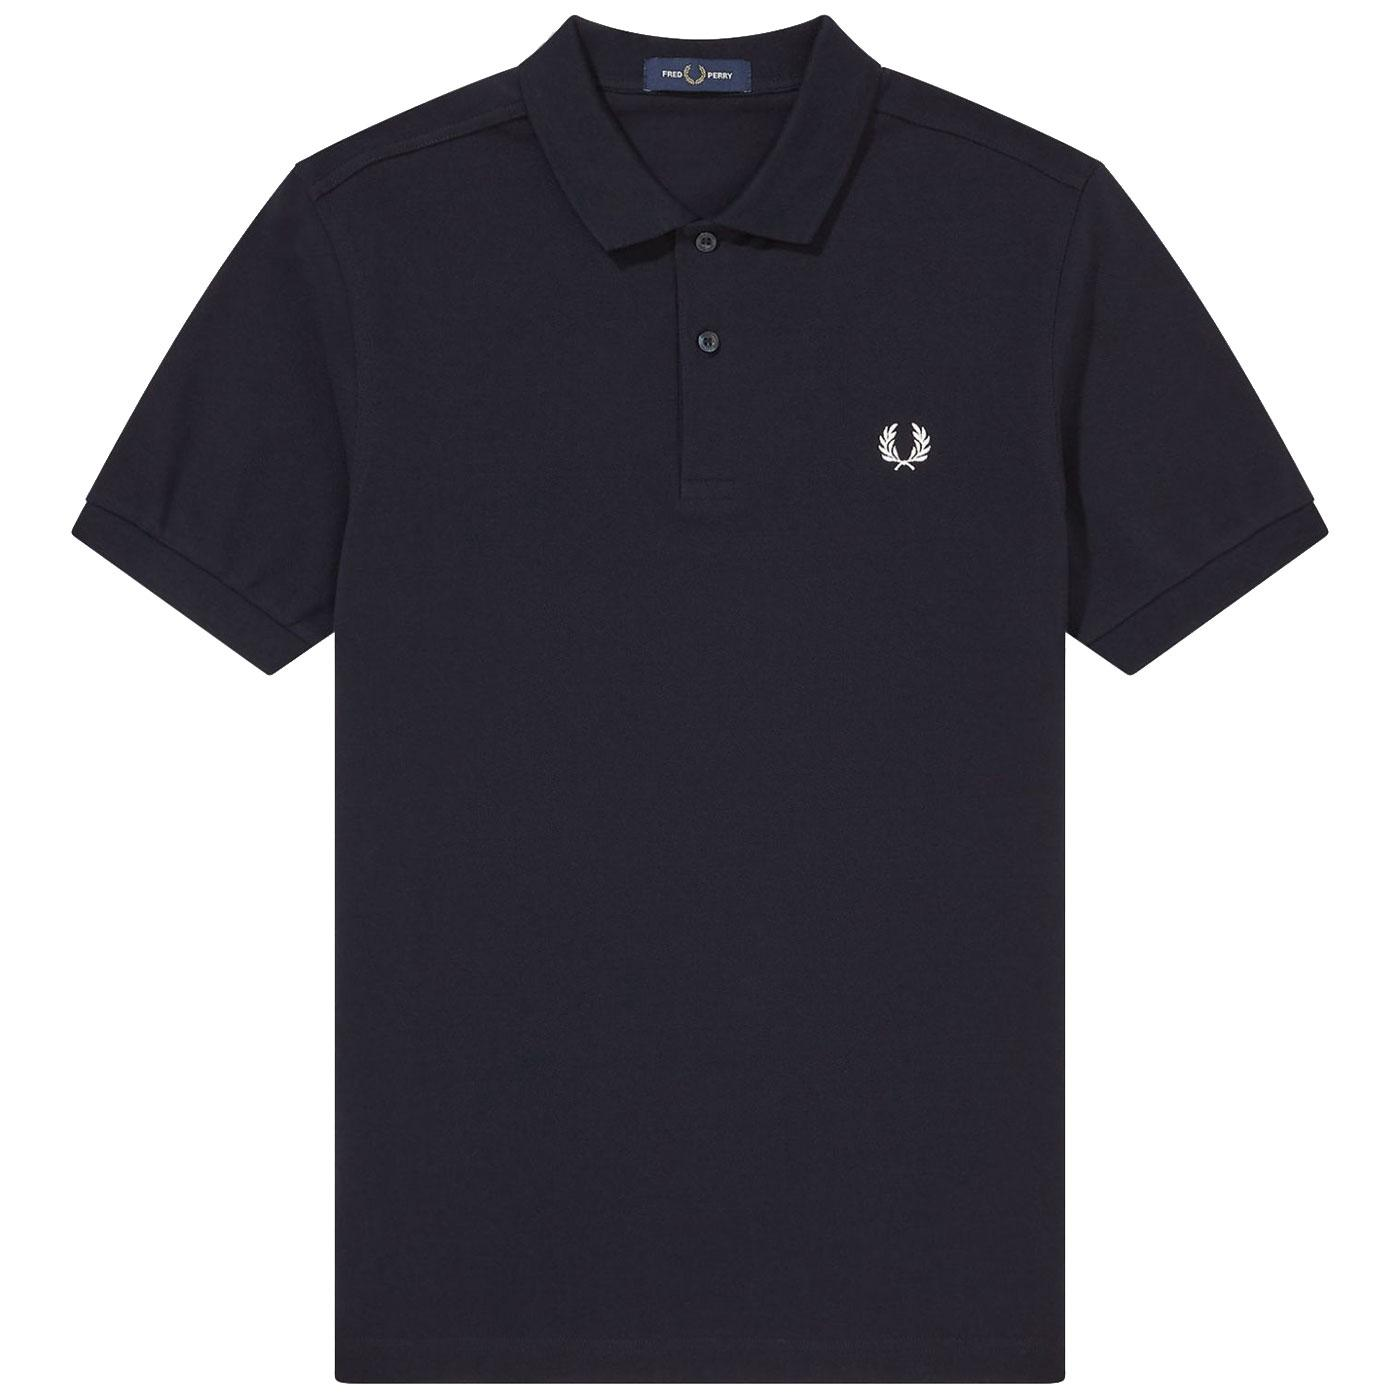 FRED PERRY Men's Retro Slim Fit Pique Polo Shirt N